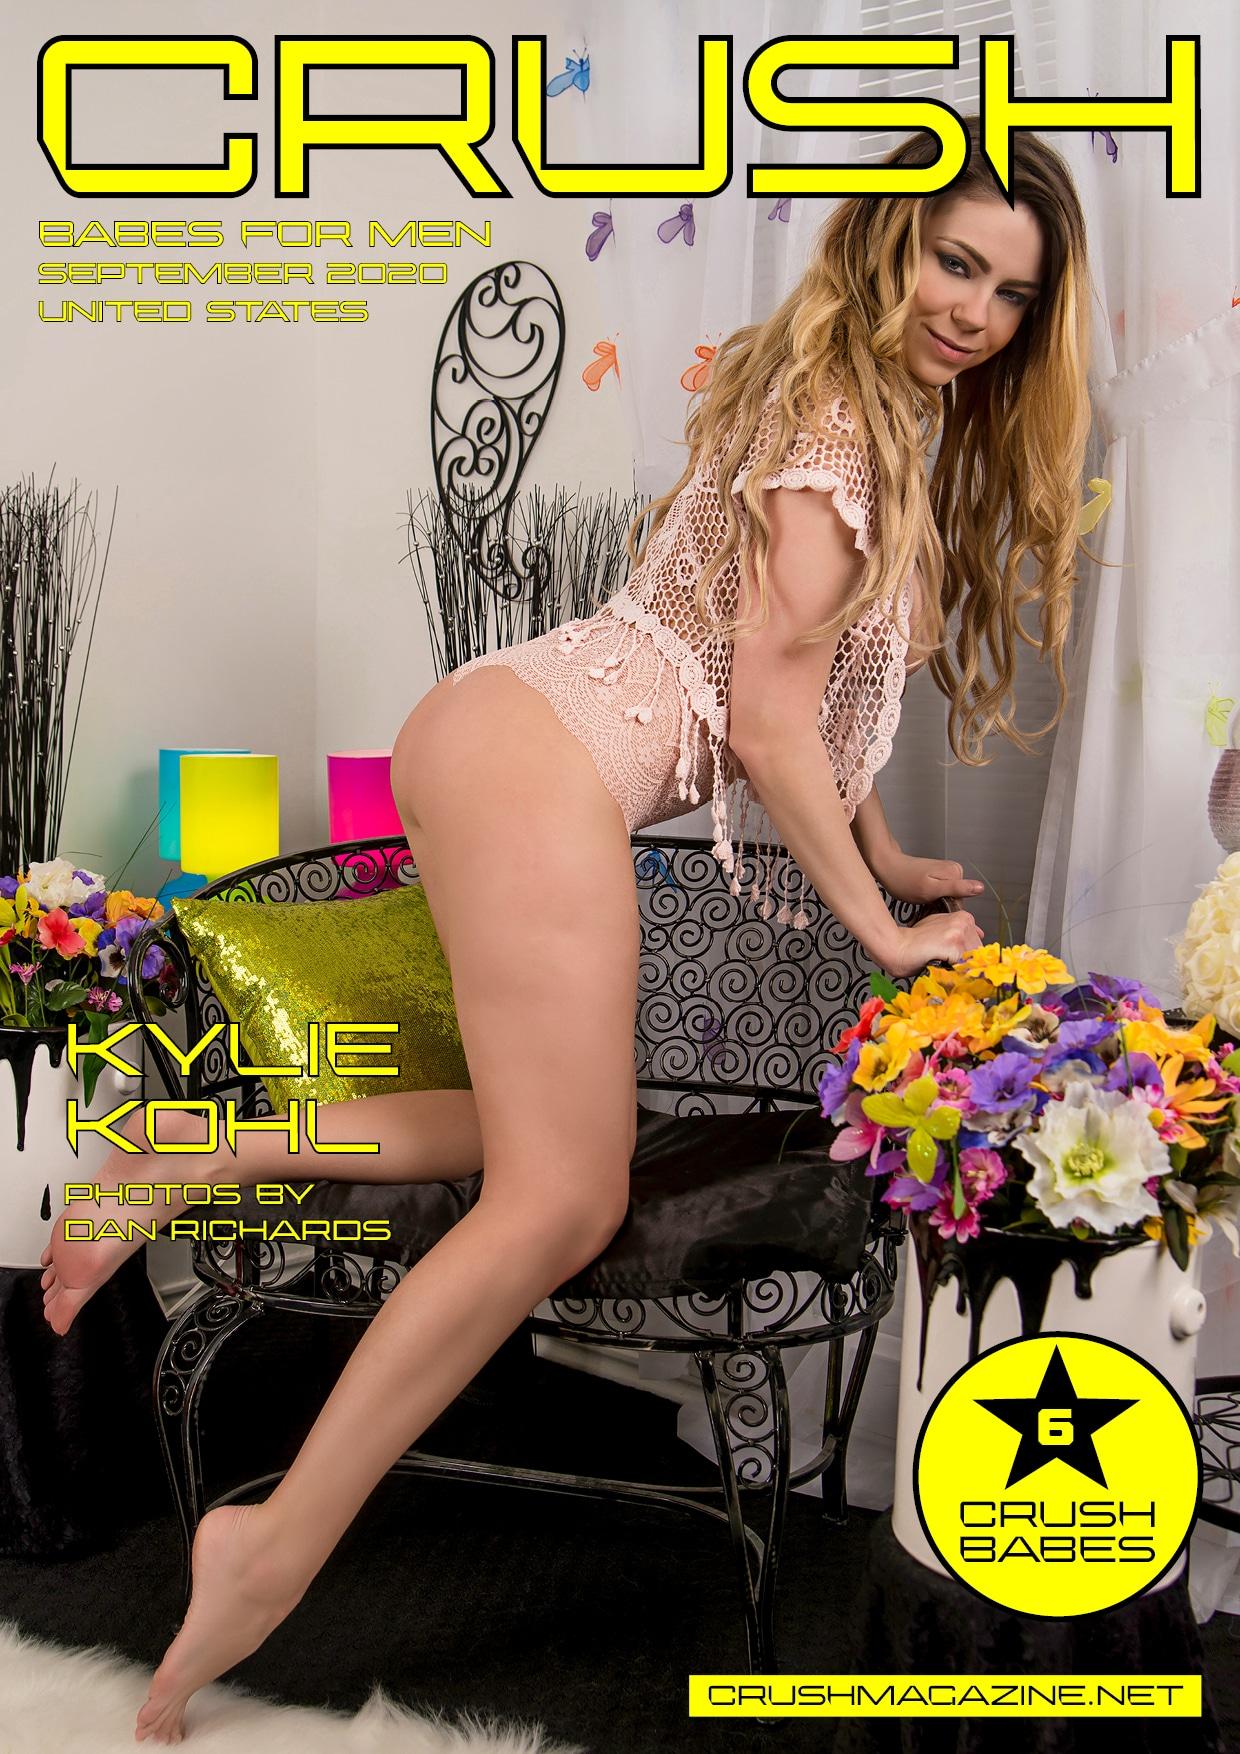 Crush Magazine - September 2020 - Angela Shukurova 2